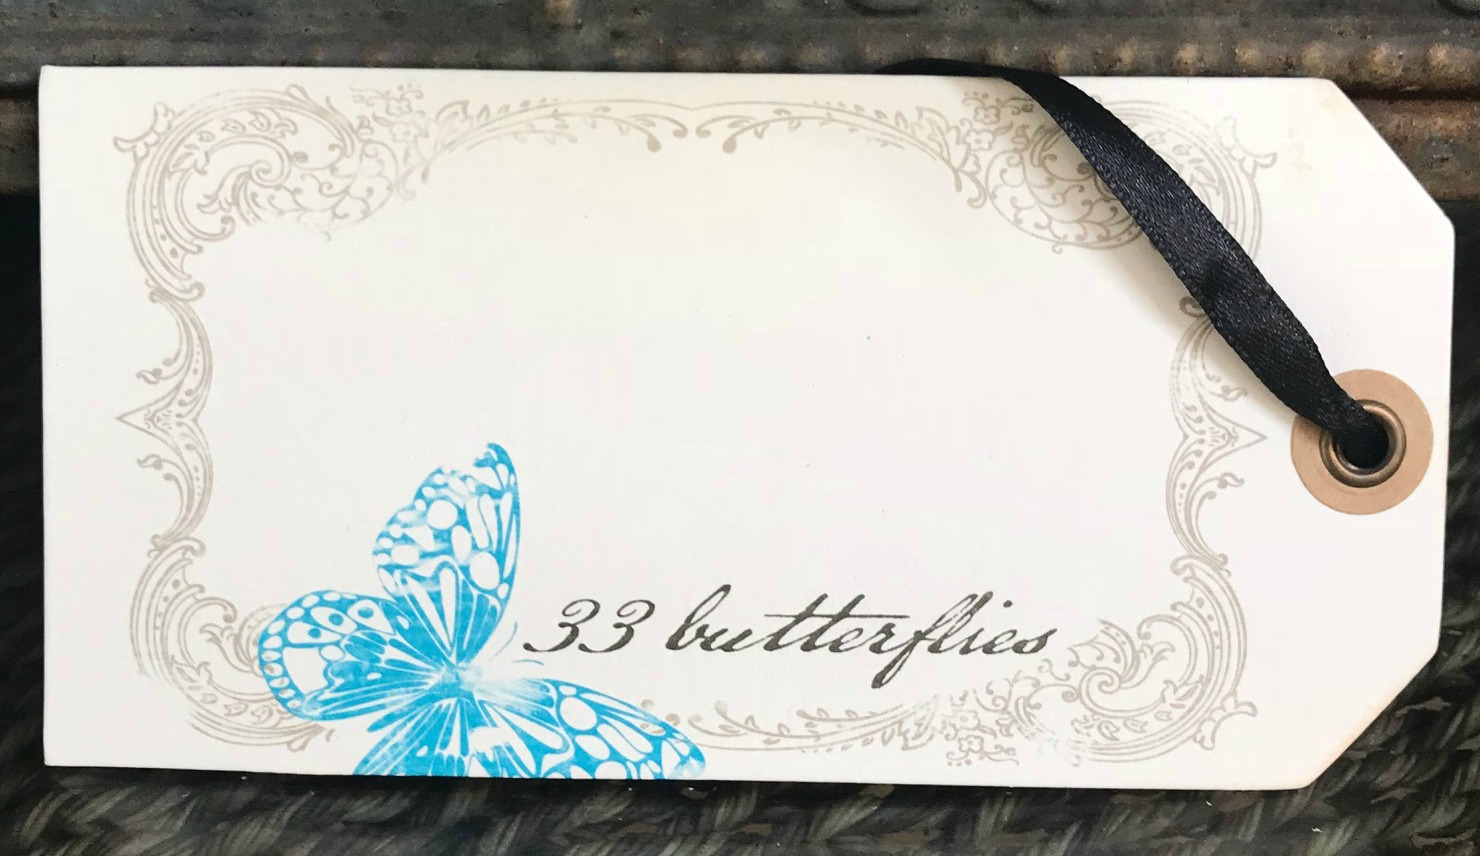 33 Butterflies Tag